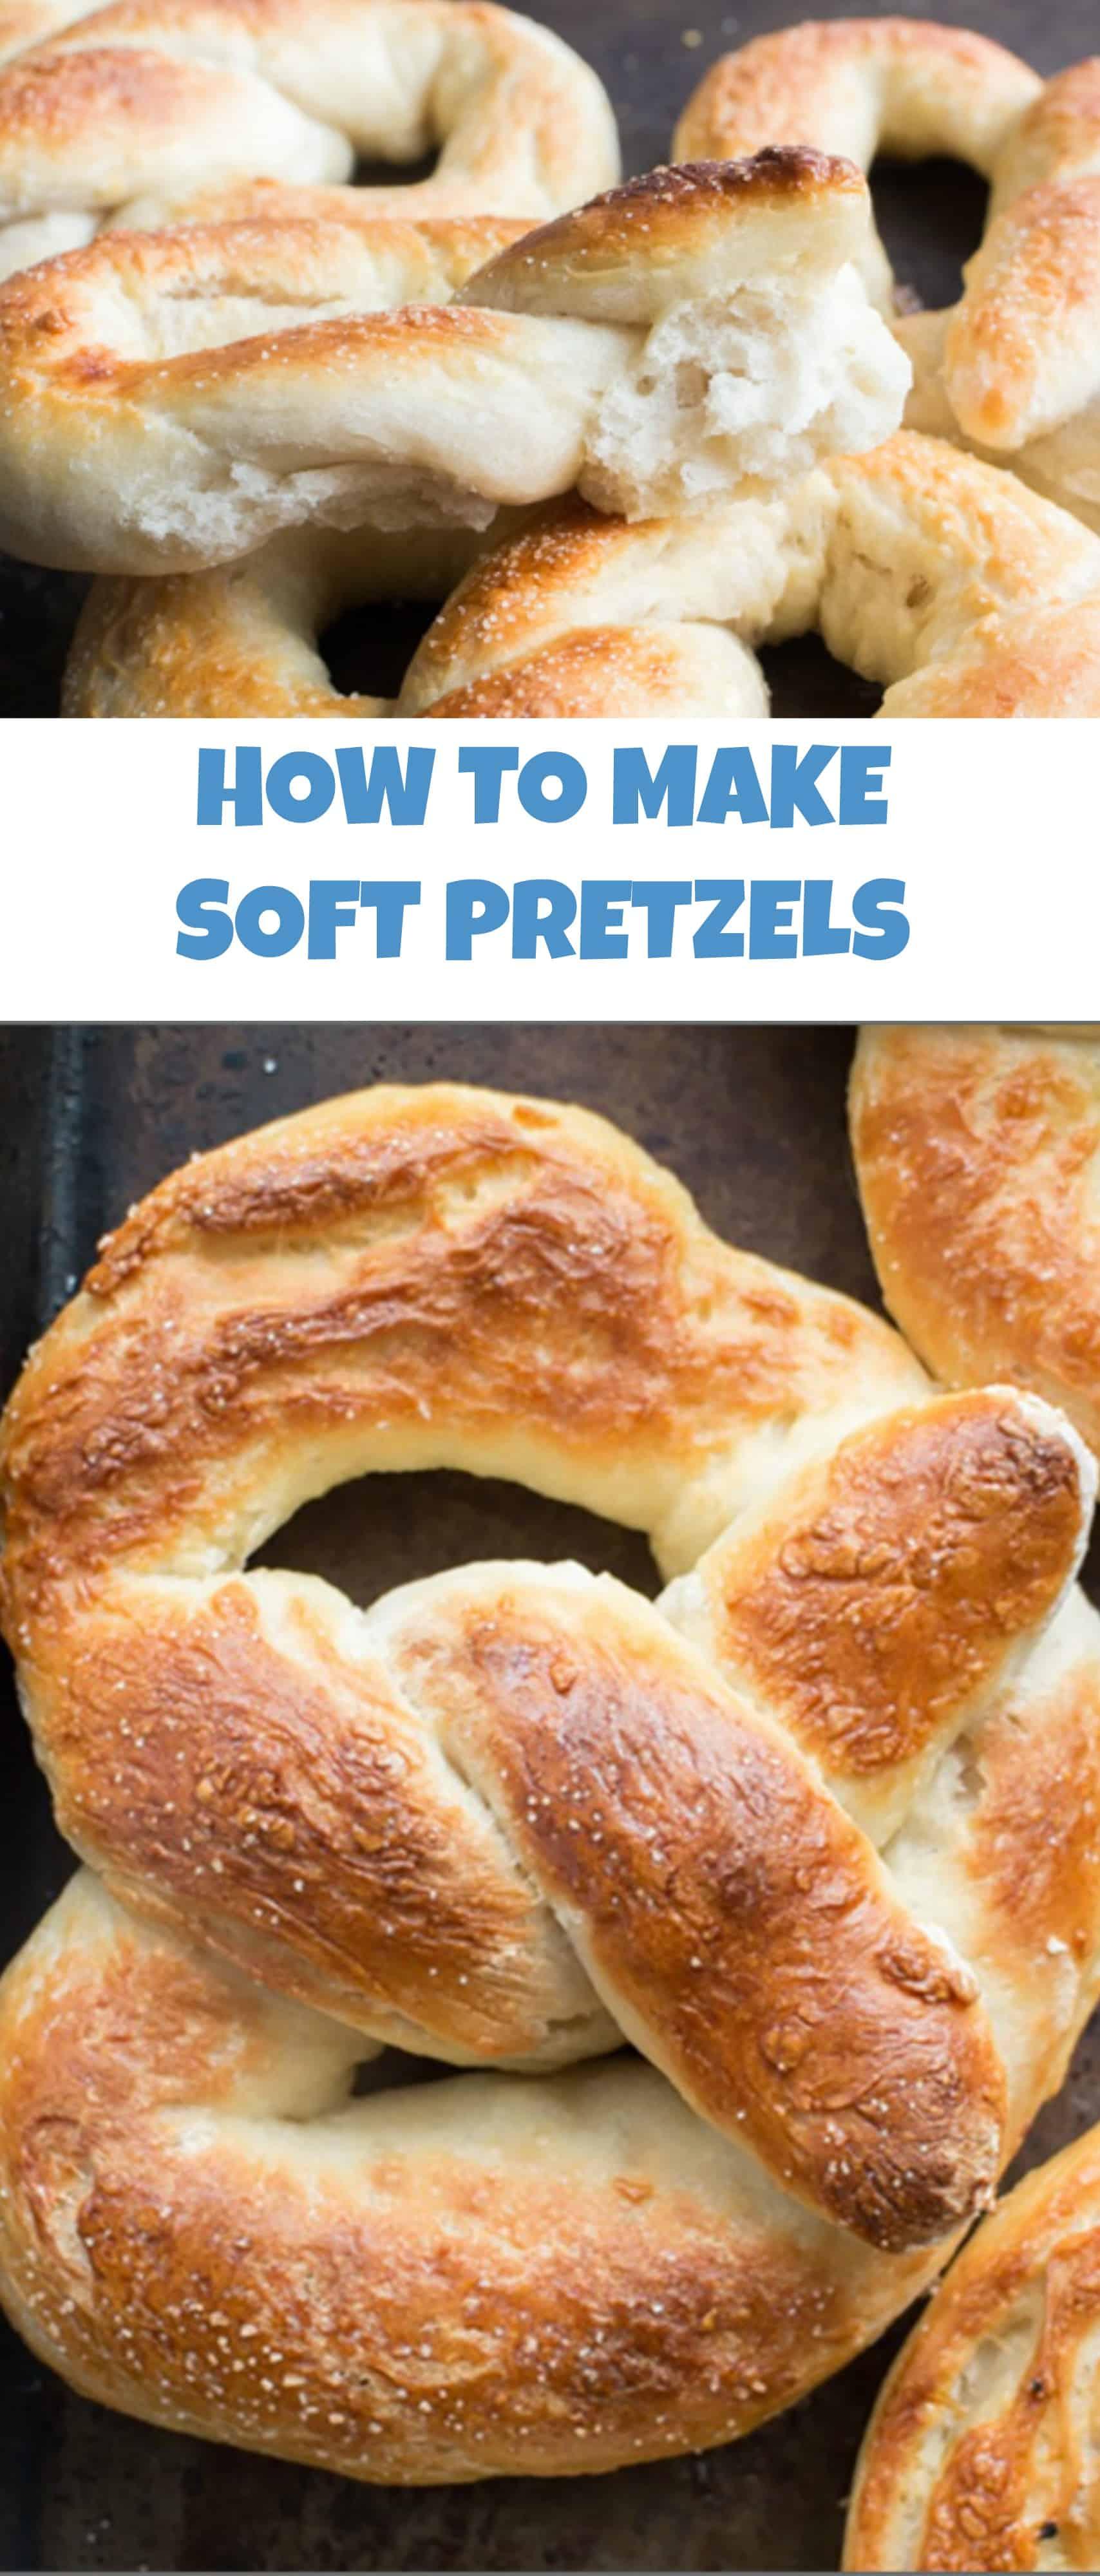 Easy Homemade Soft Pretzels Recipe - Brooklyn Farm Girl